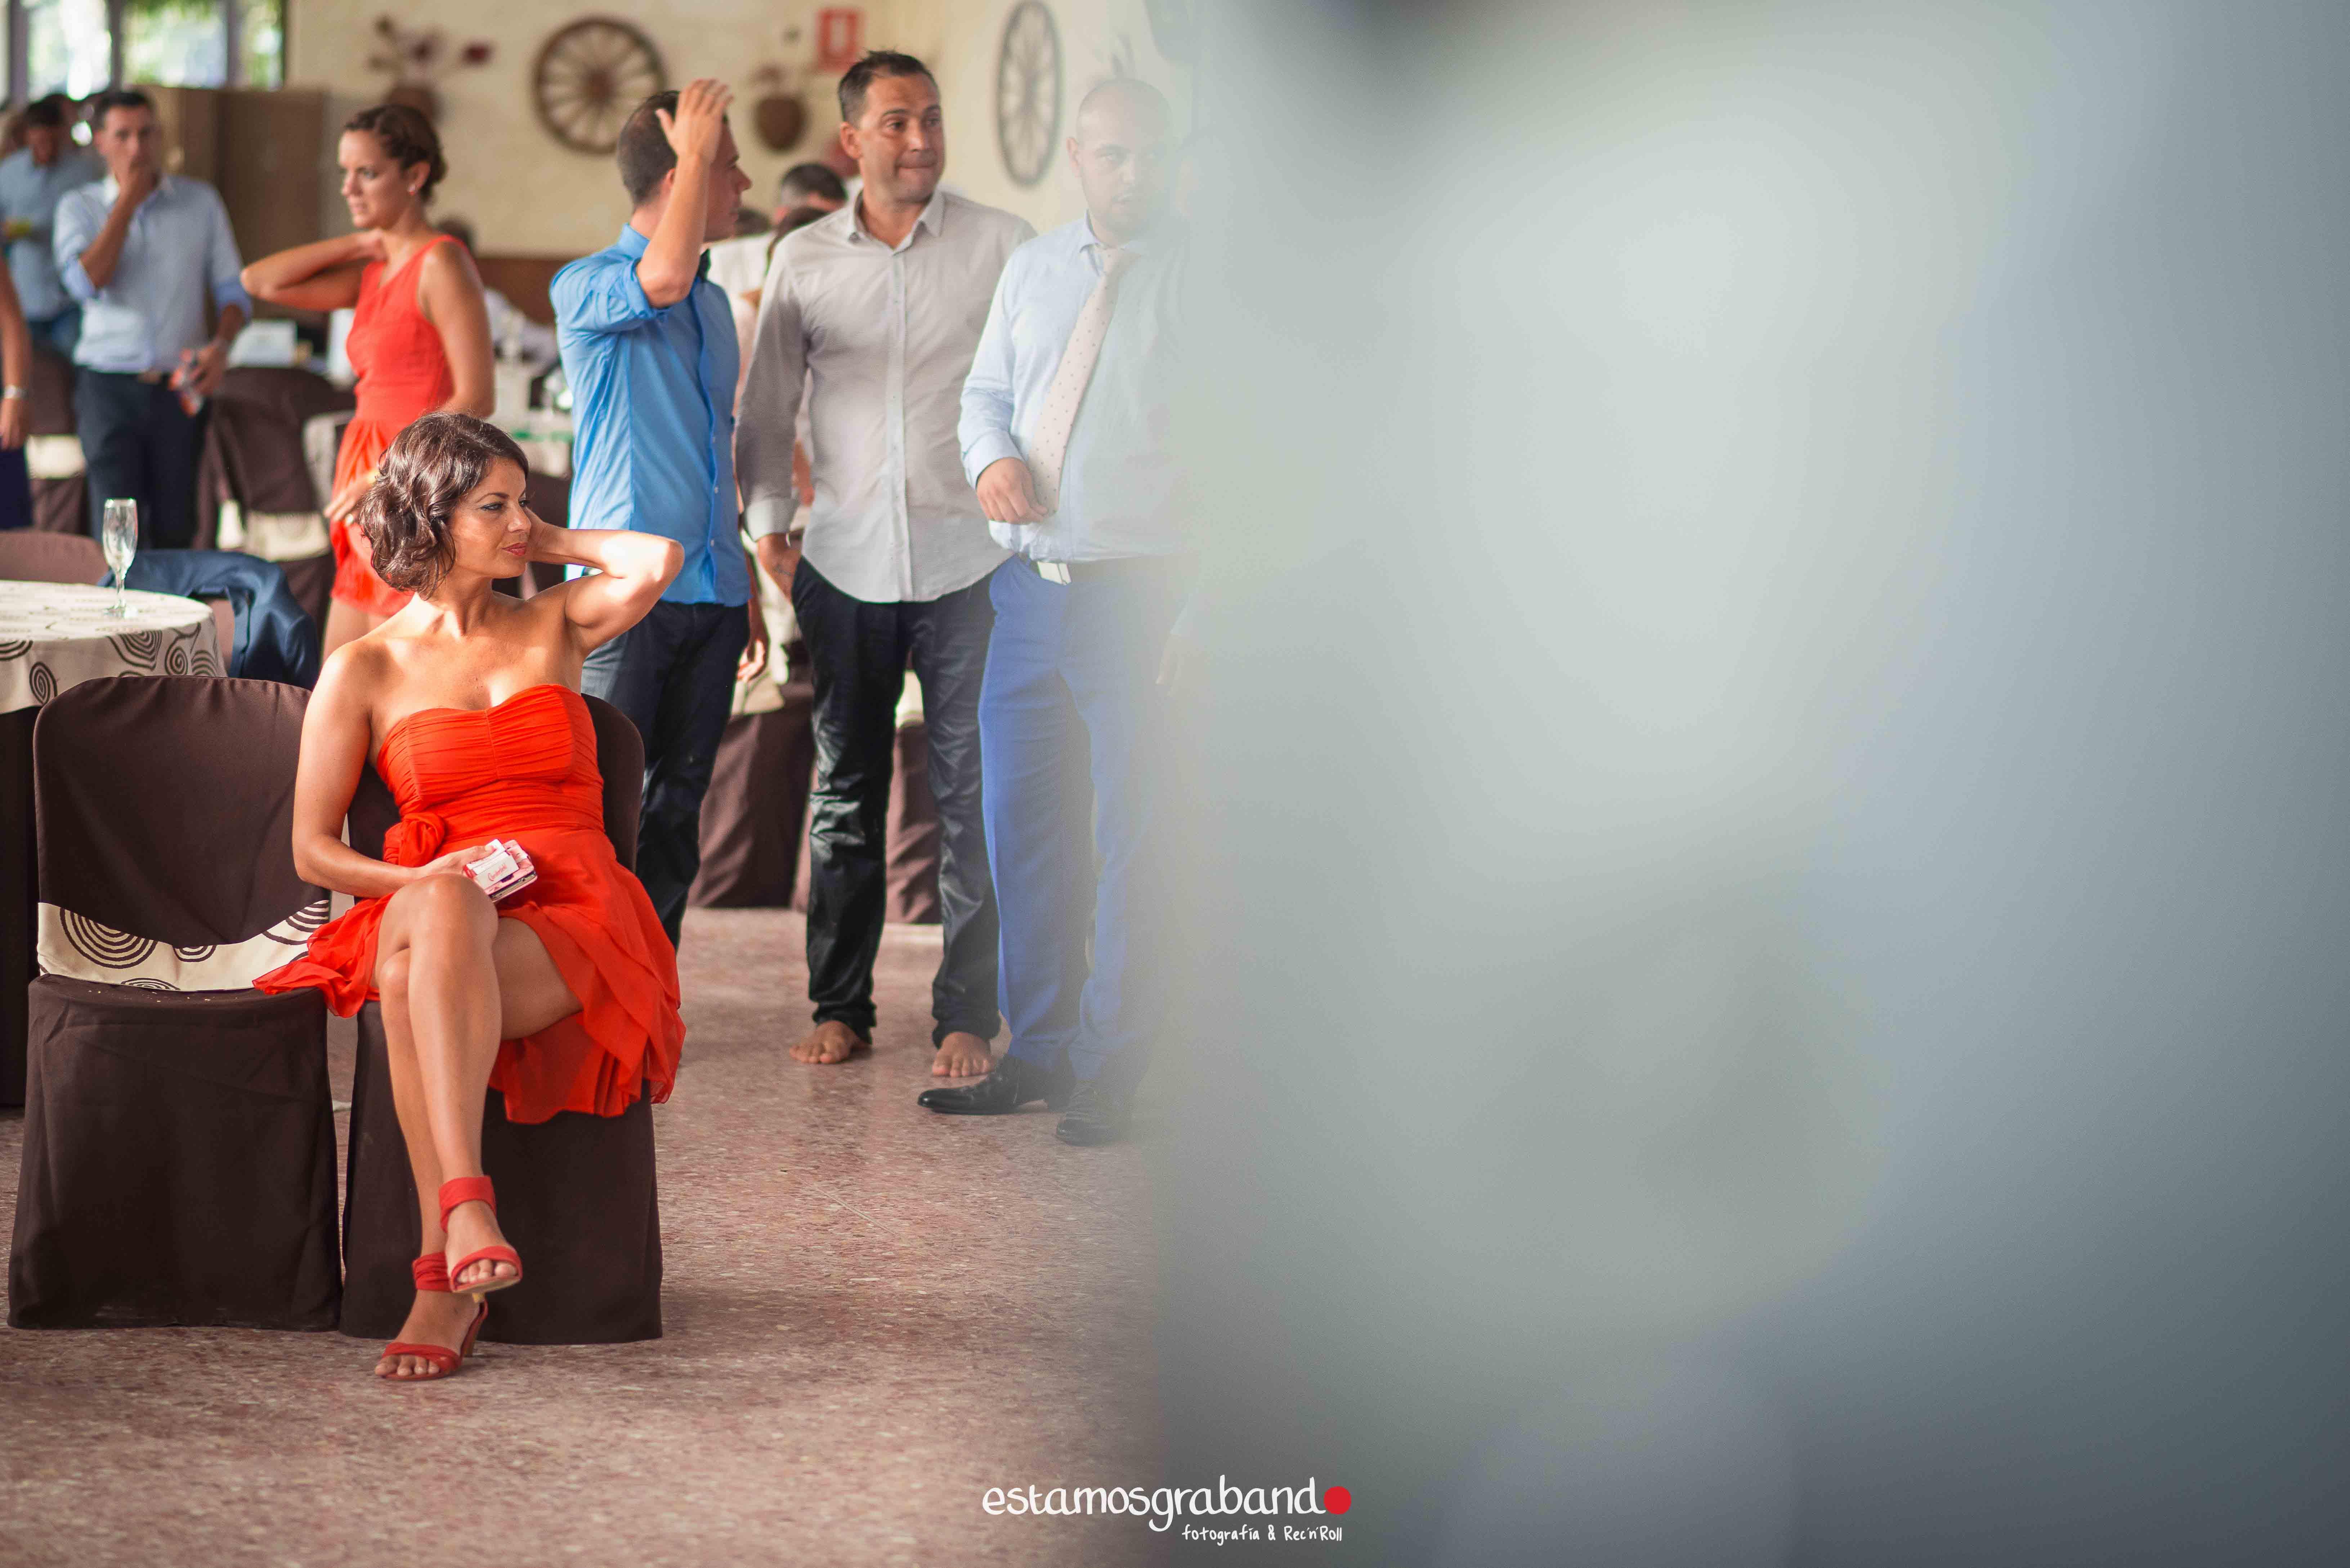 pili-y-jose_fotograficc81a-cadiz-95 Pili & Jose - video boda cadiz